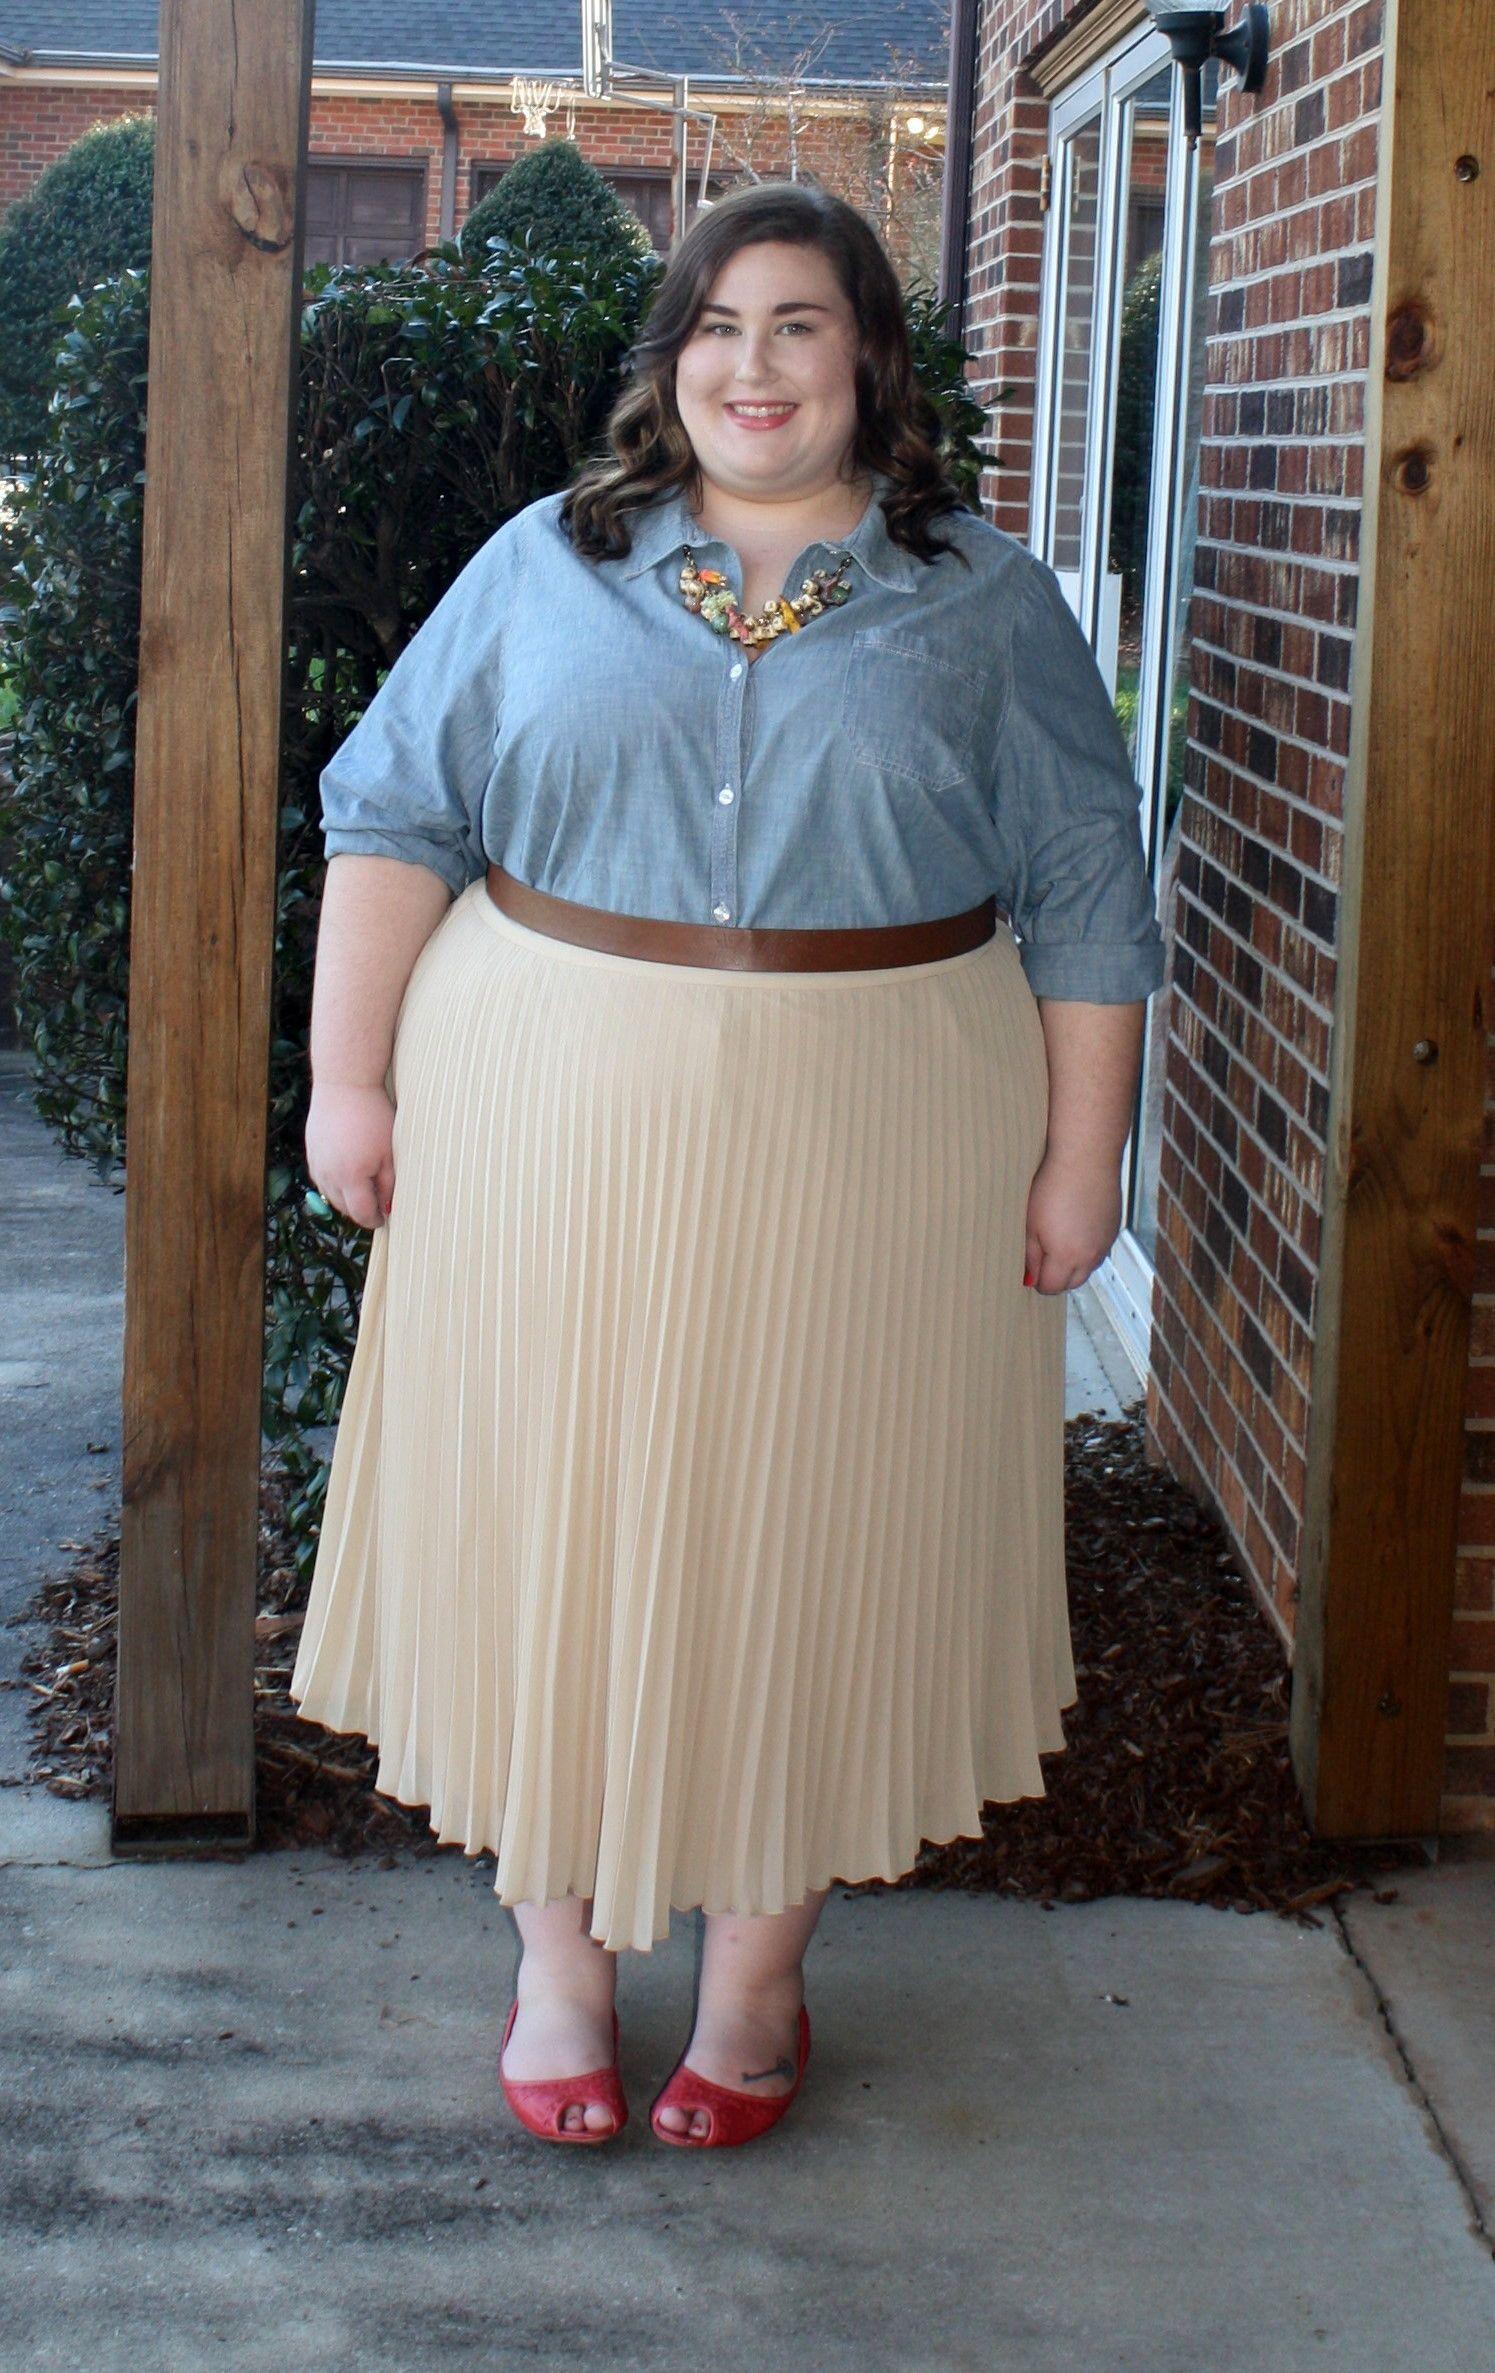 khaki skirt   Fit   Pinterest   Skirts, Khakis and Trends